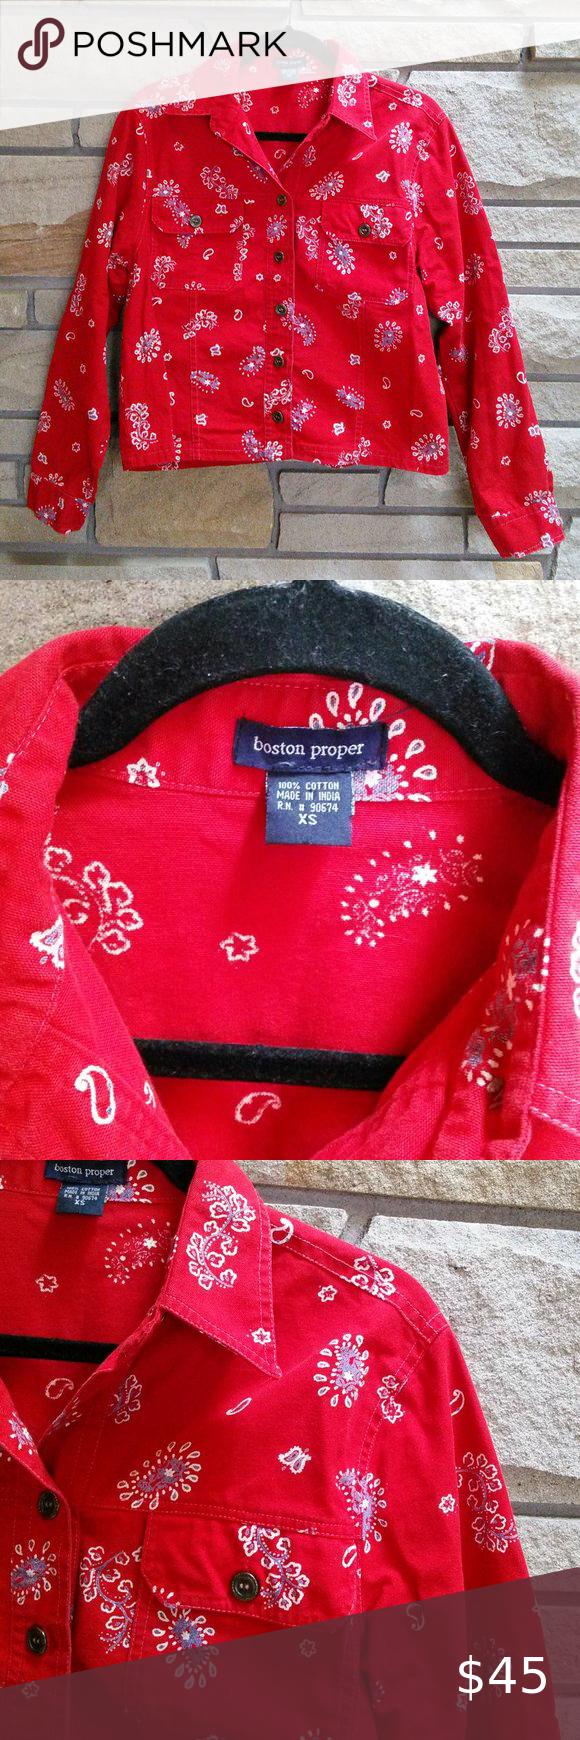 Boston Proper Denim Jacket Red Bandana Print Xs Boston Proper Denim Style Button Front Jacket In Amazing Western Paisley B Red Jacket Bandana Print Red Bandana [ 1740 x 580 Pixel ]